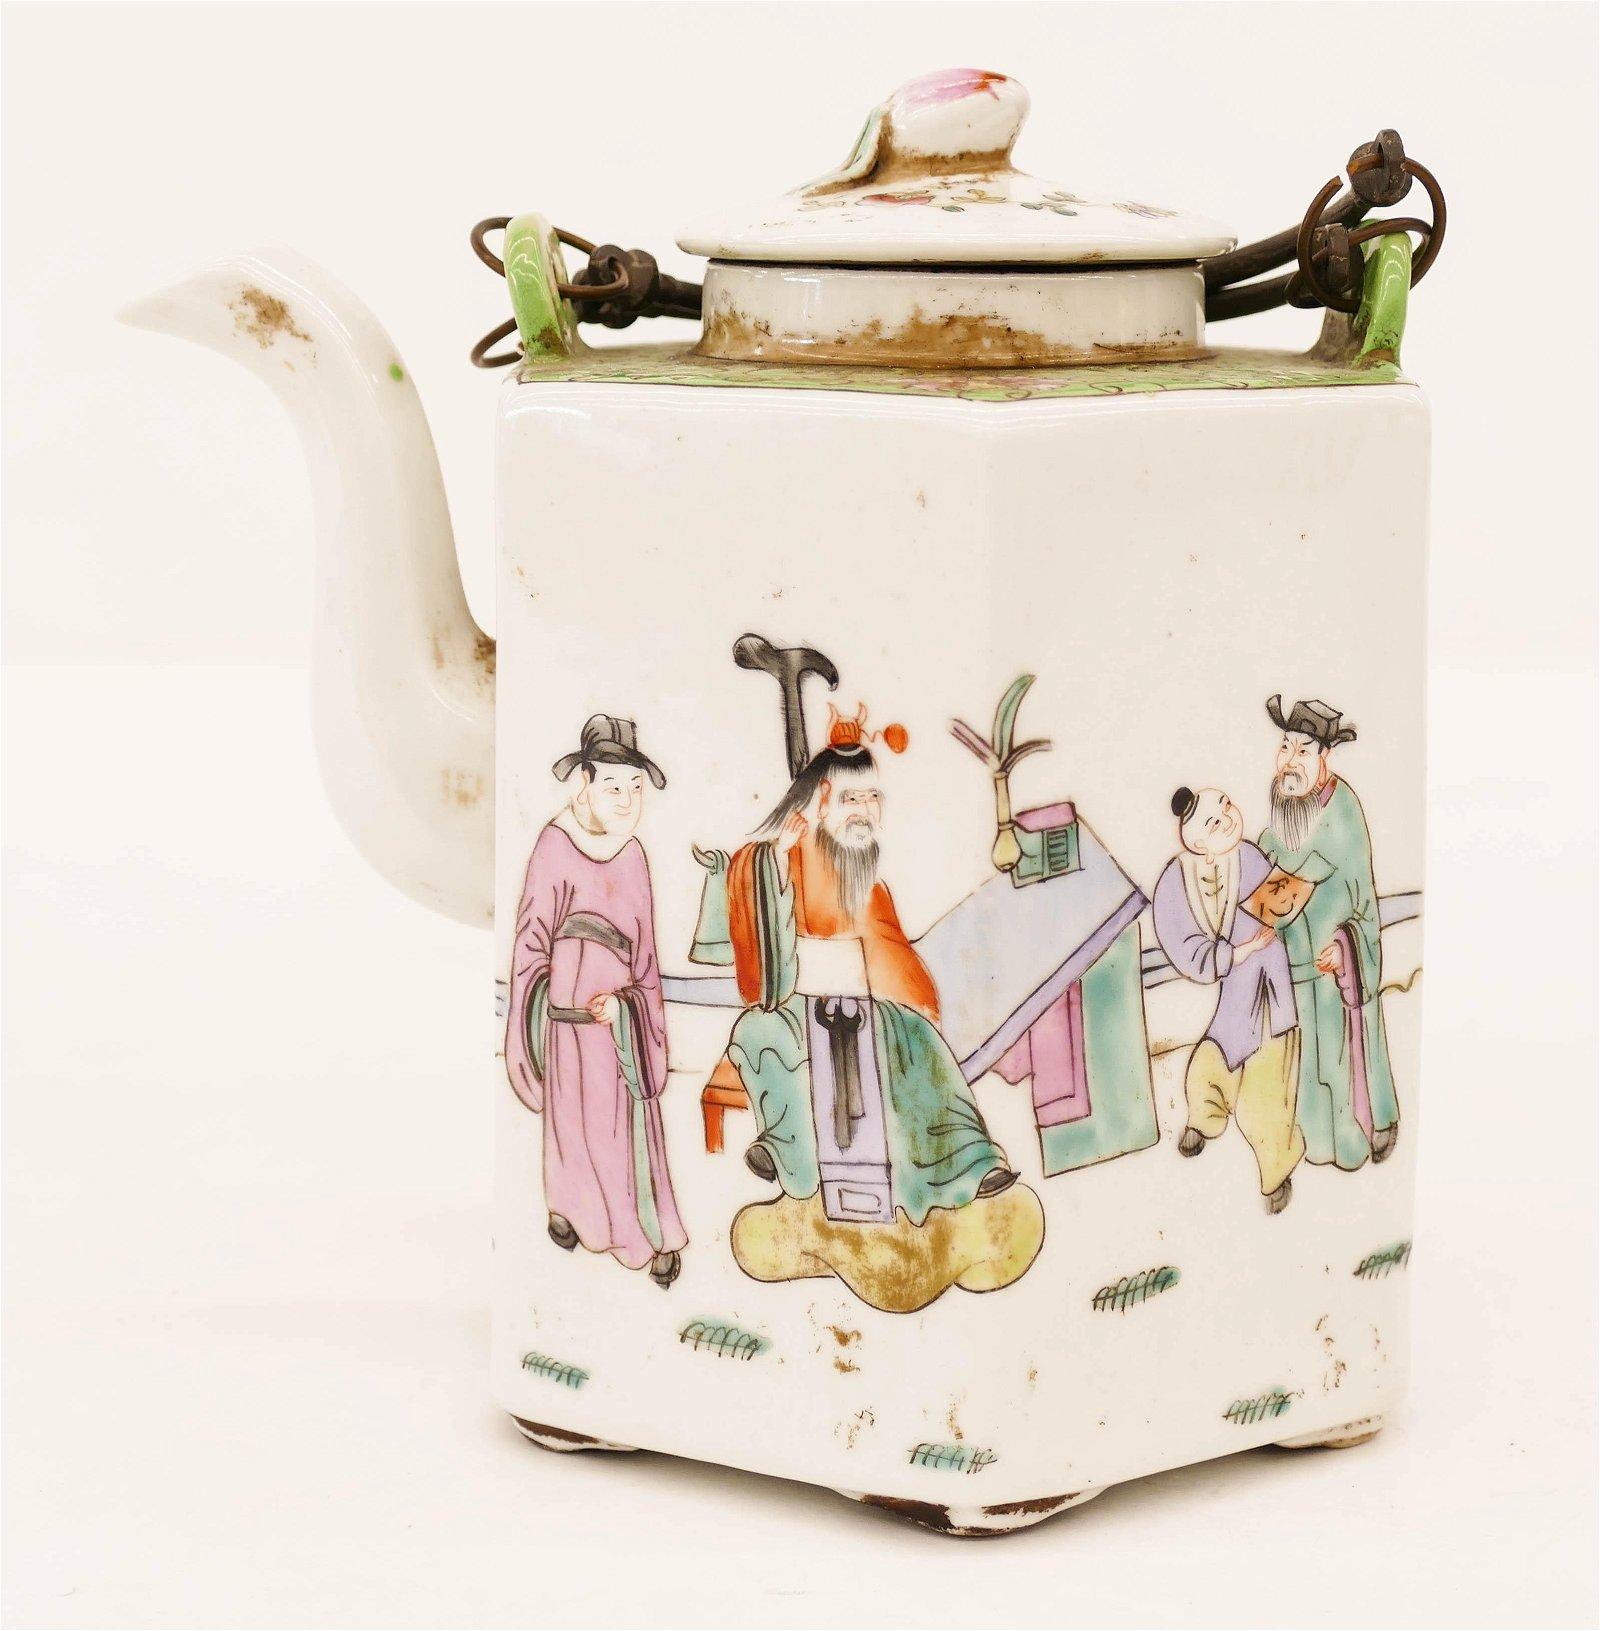 Chinese Tongzhi Porcelain Teapot 6''x6''. Famille rose